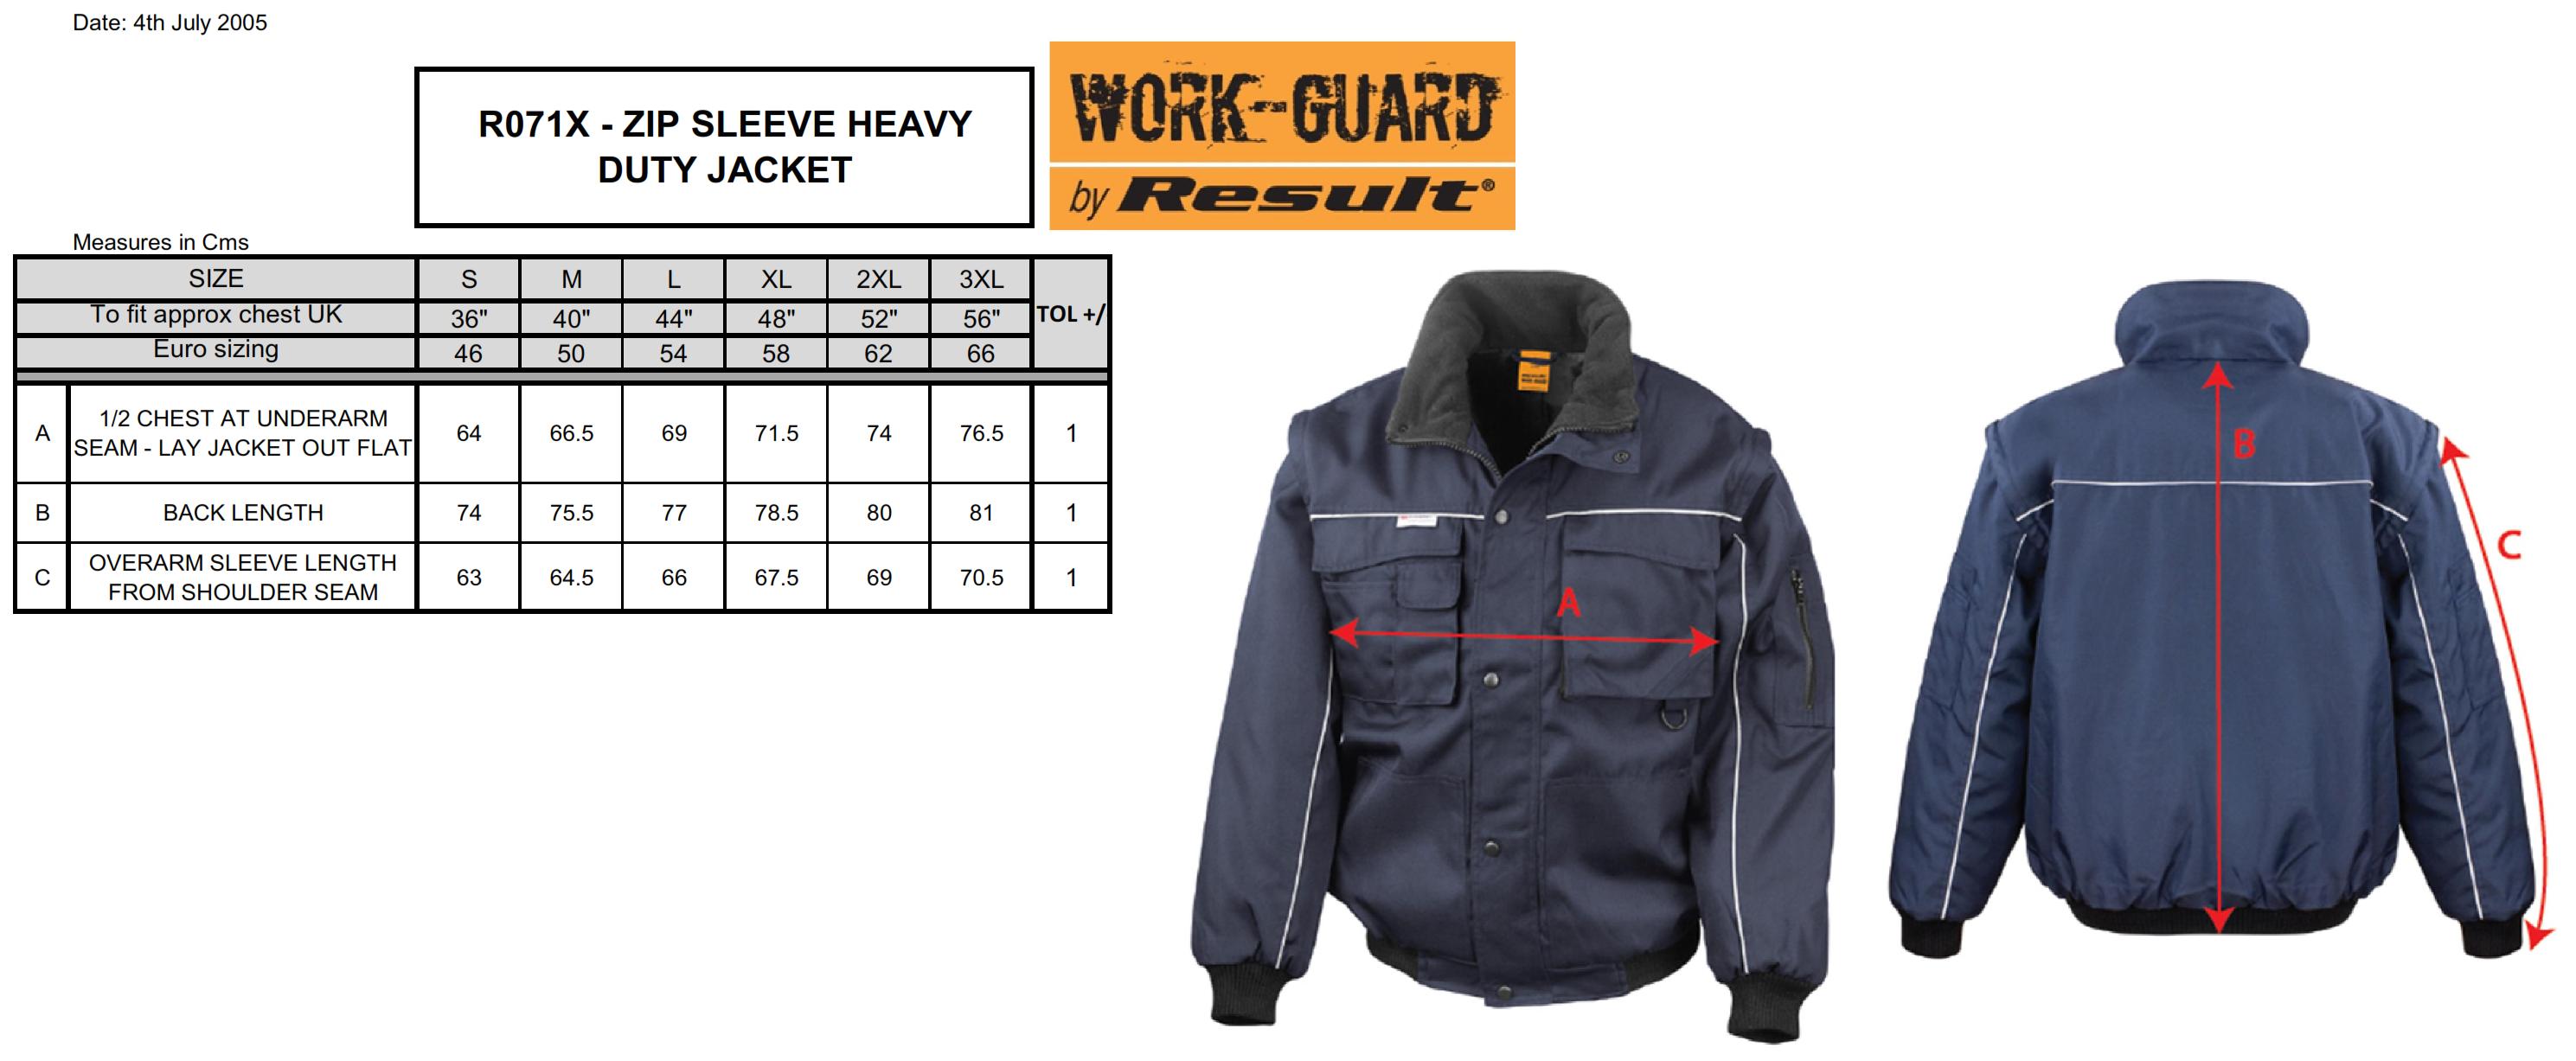 Result: Heavy Duty Jacket R071X